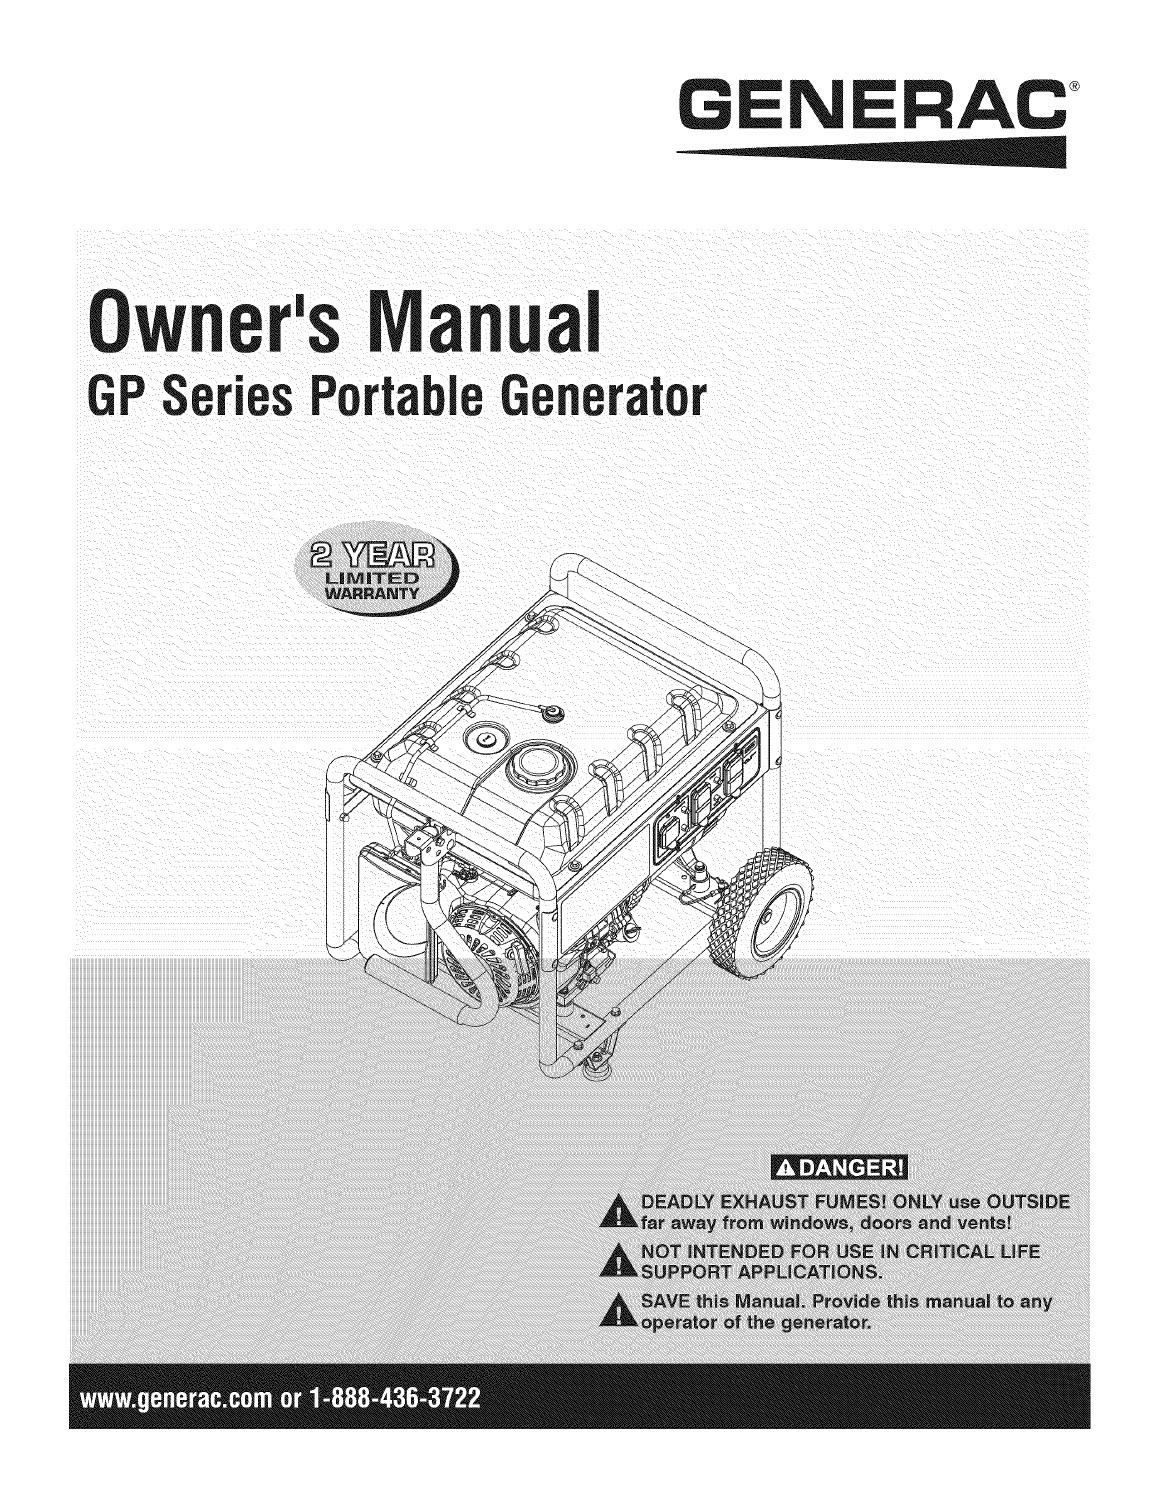 Shop Generac 200 Manual Guide